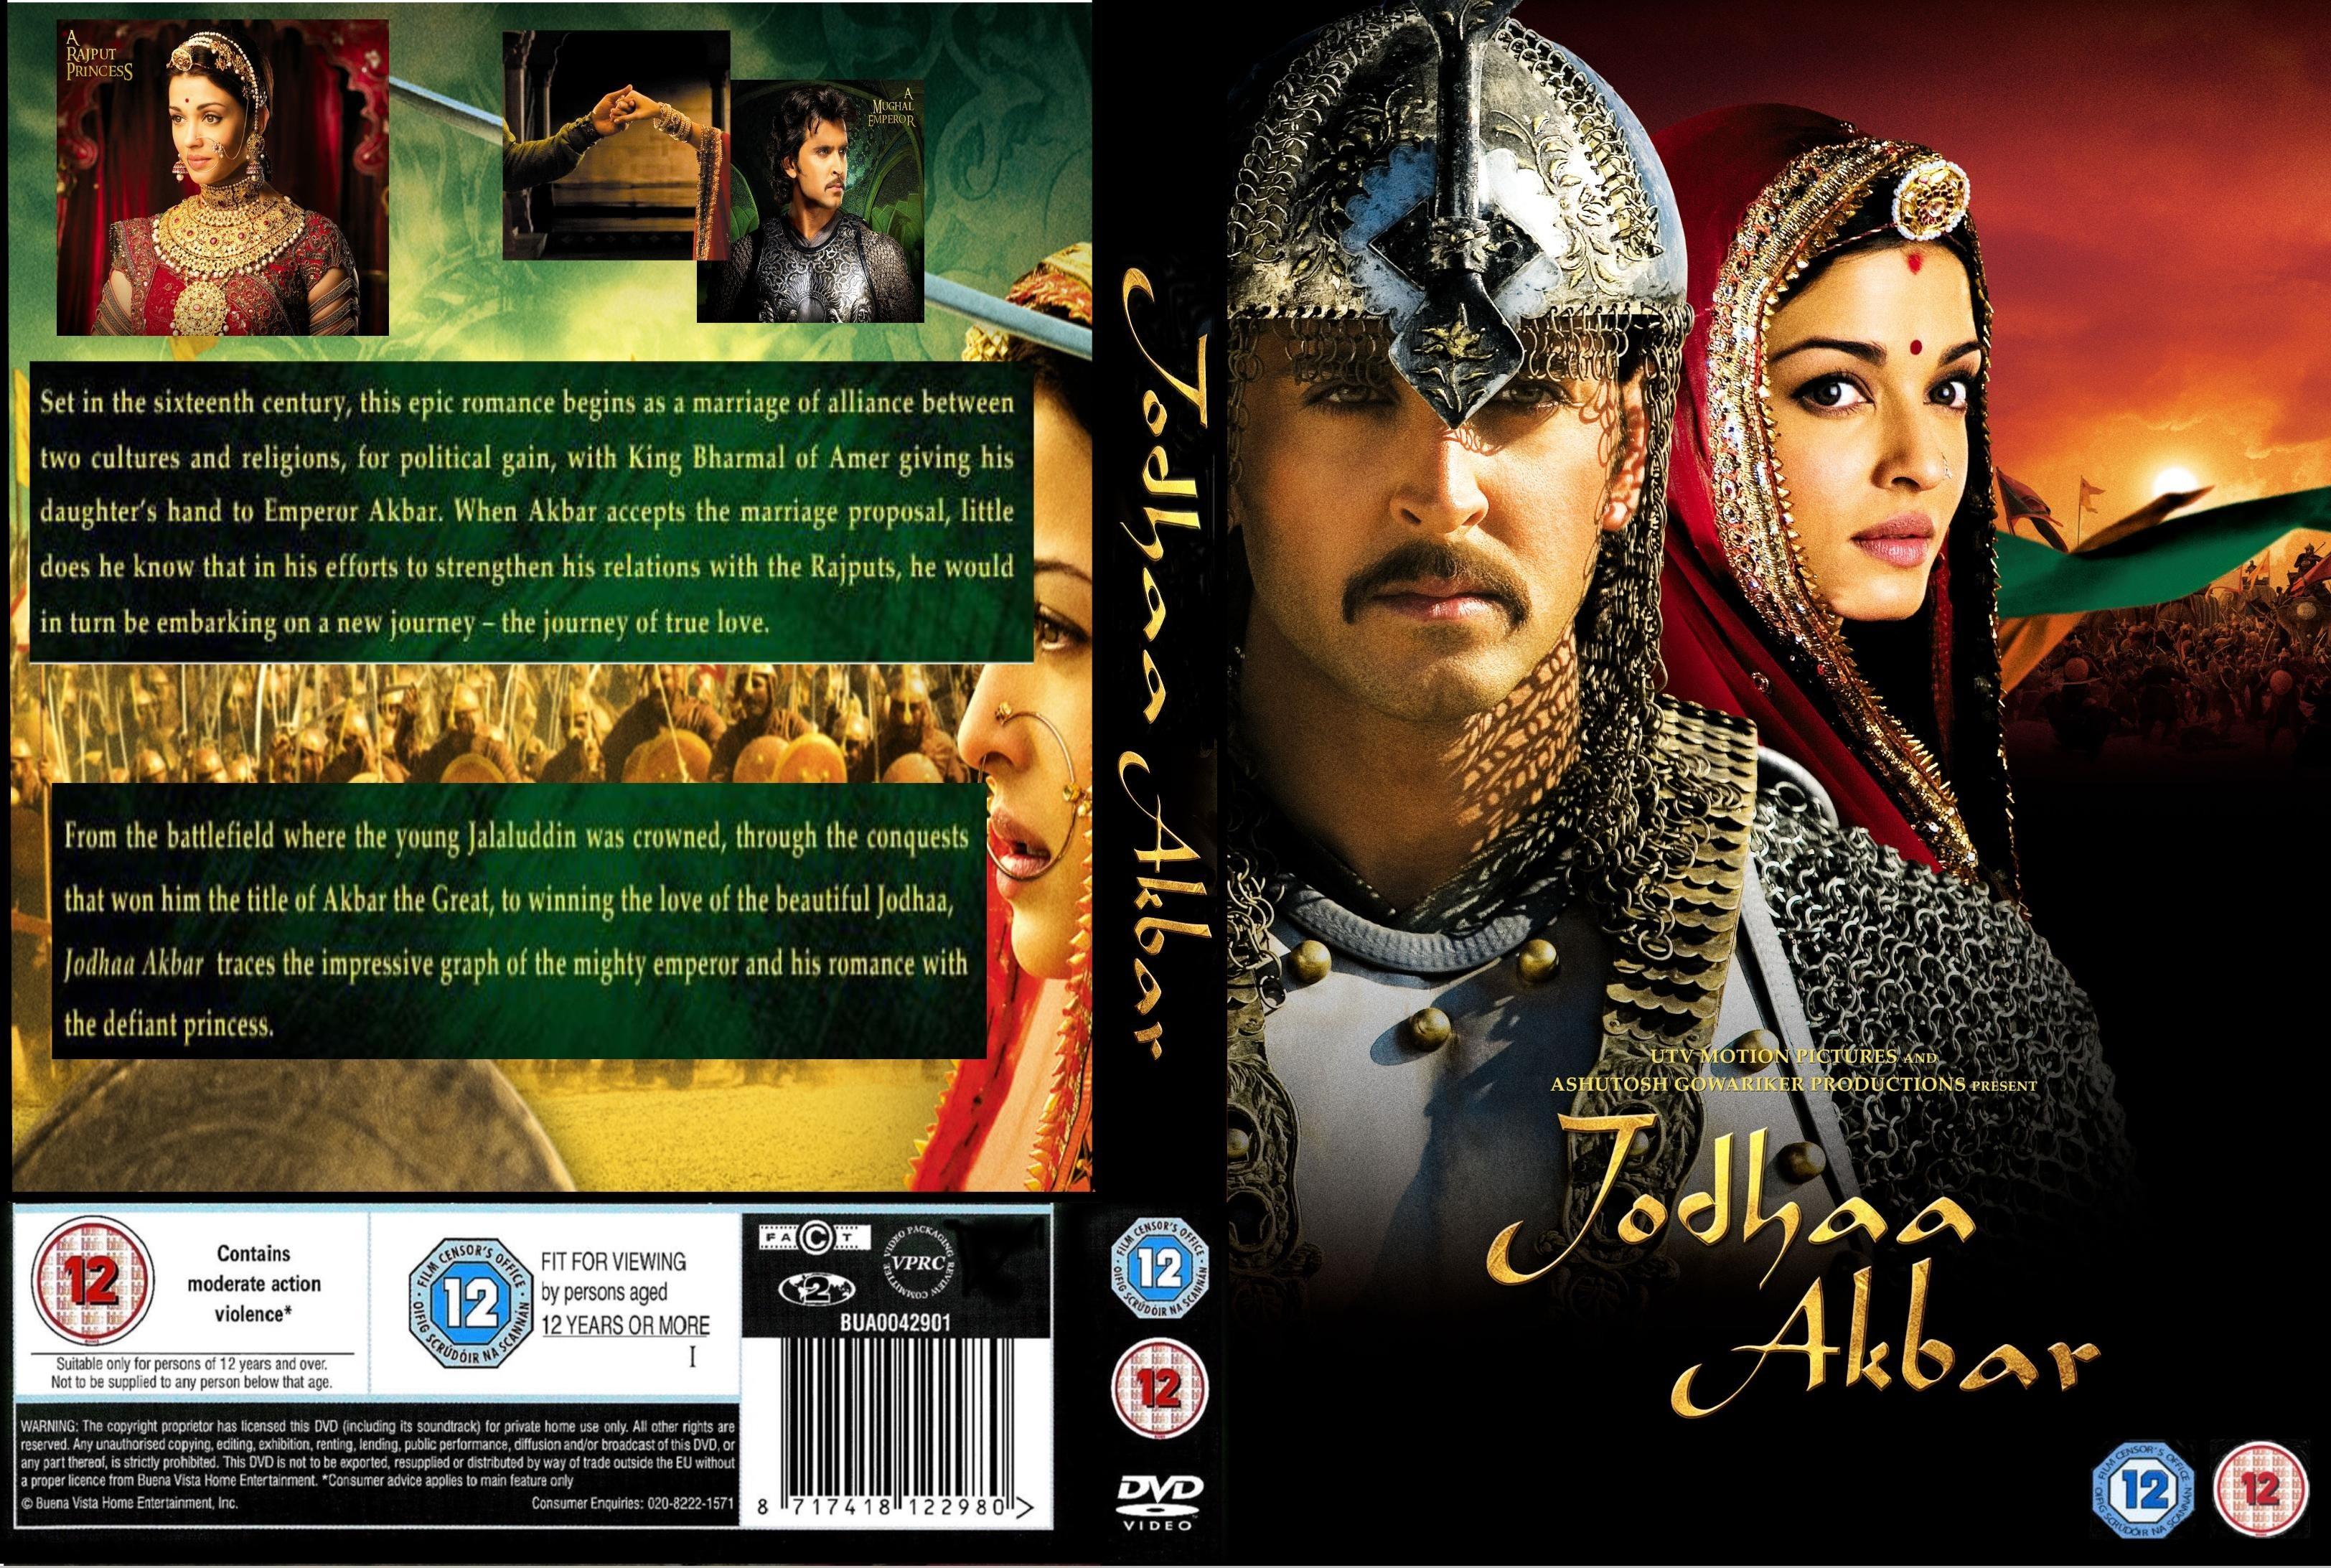 jodha akbar dvd